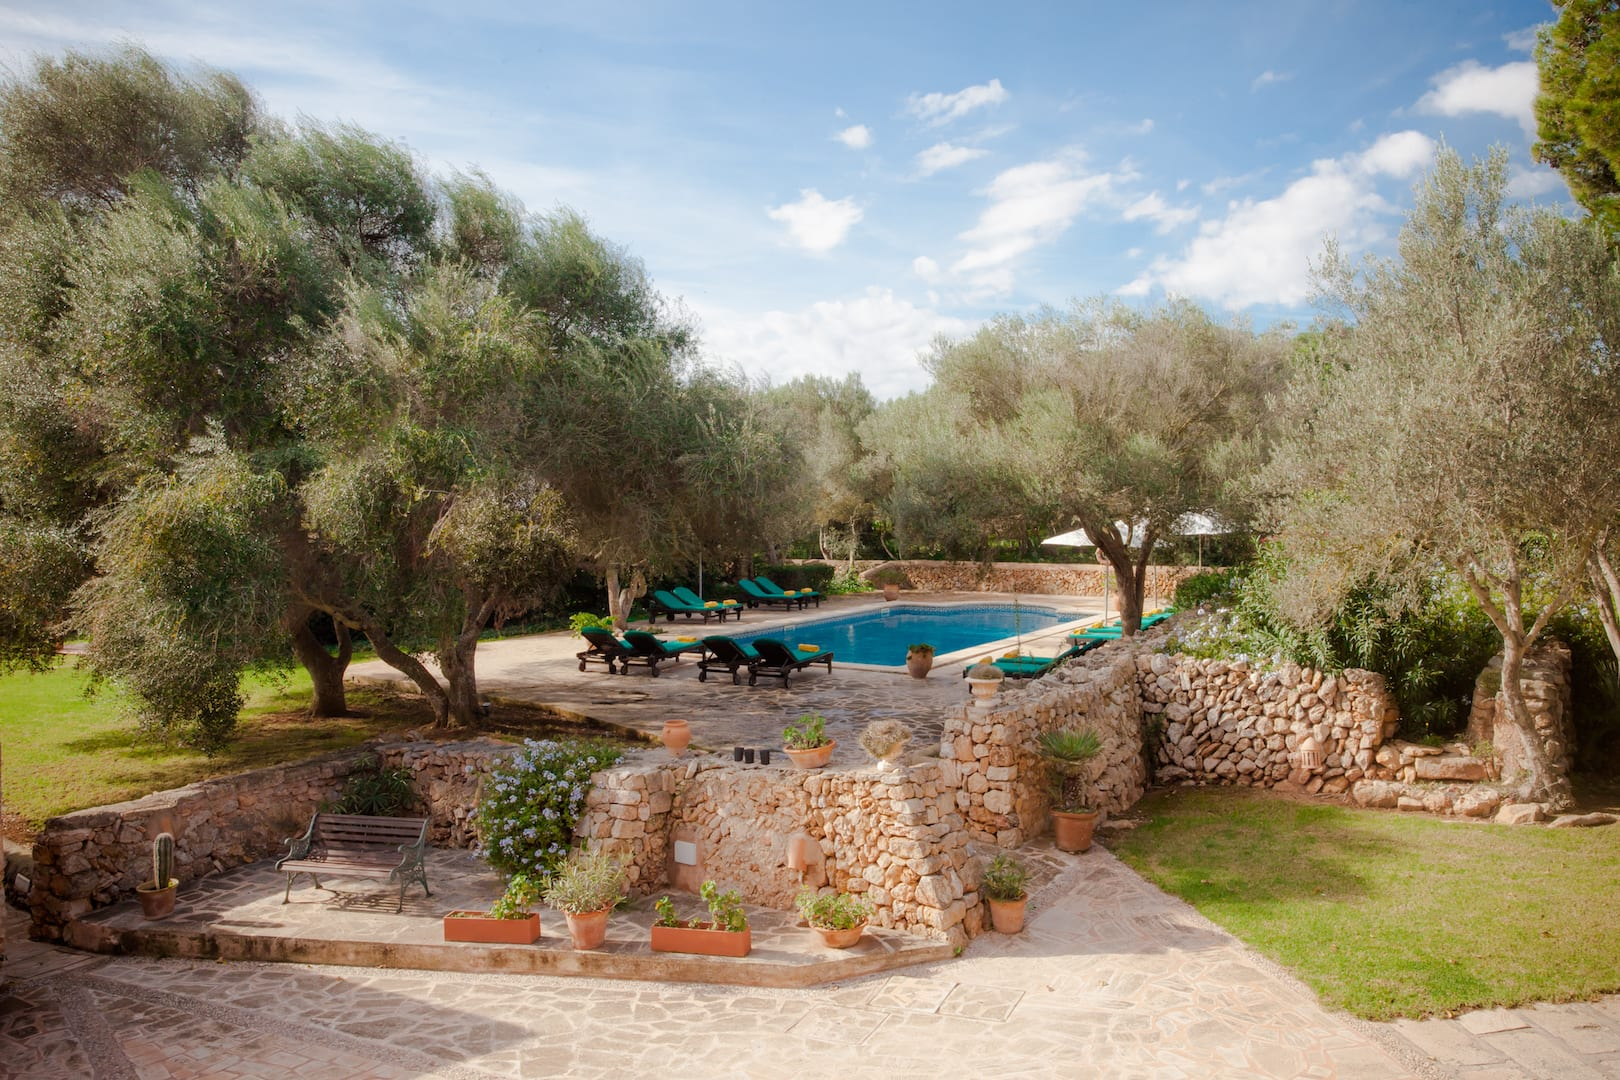 ISLA_Travel_Hotel_Sa_Galera_Poolterrasse